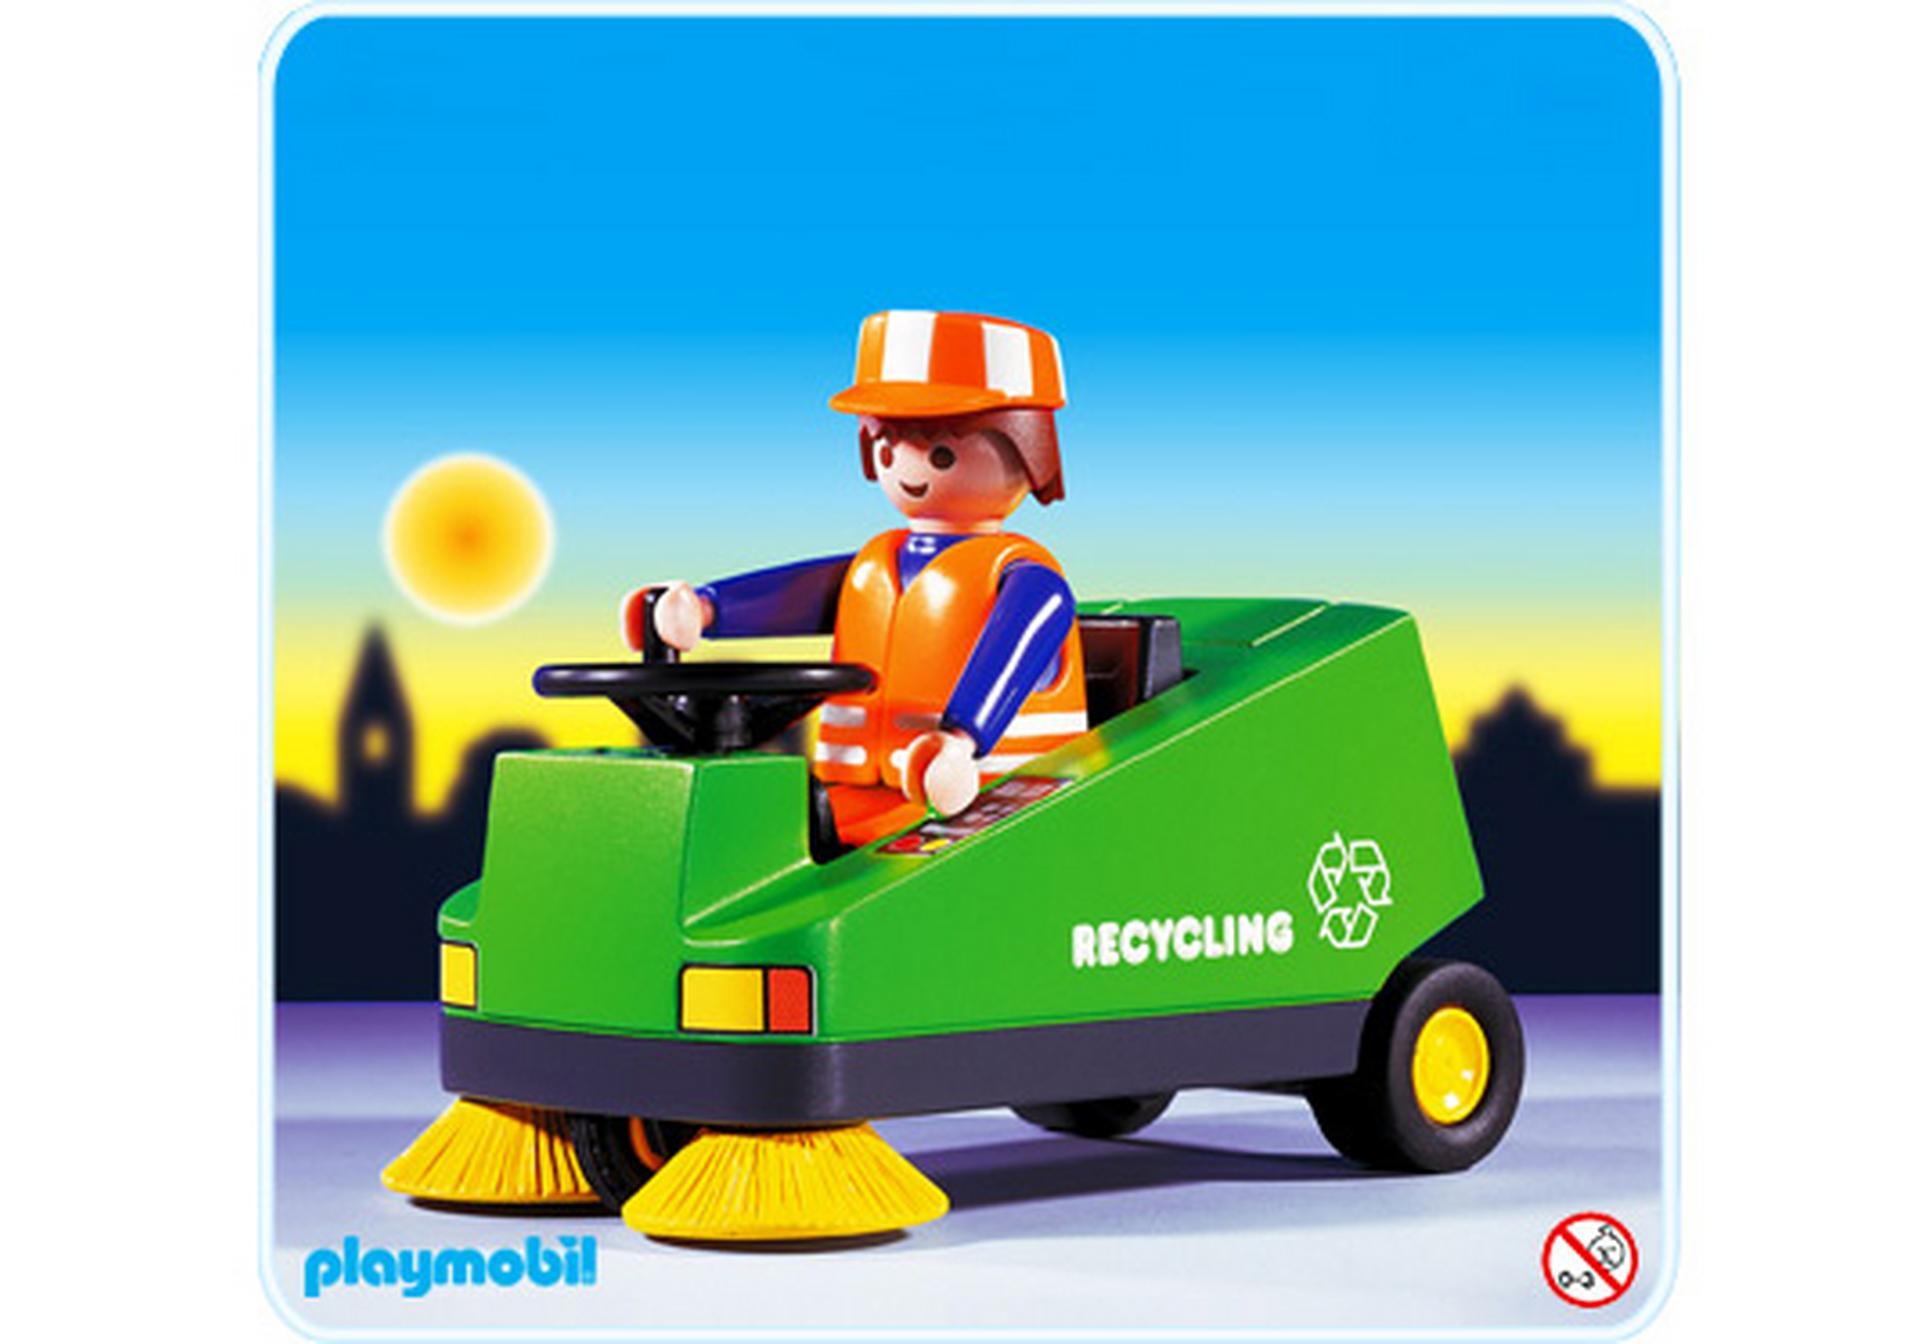 Kehrmaschine 3790 a playmobil deutschland for Jugendzimmer playmobil